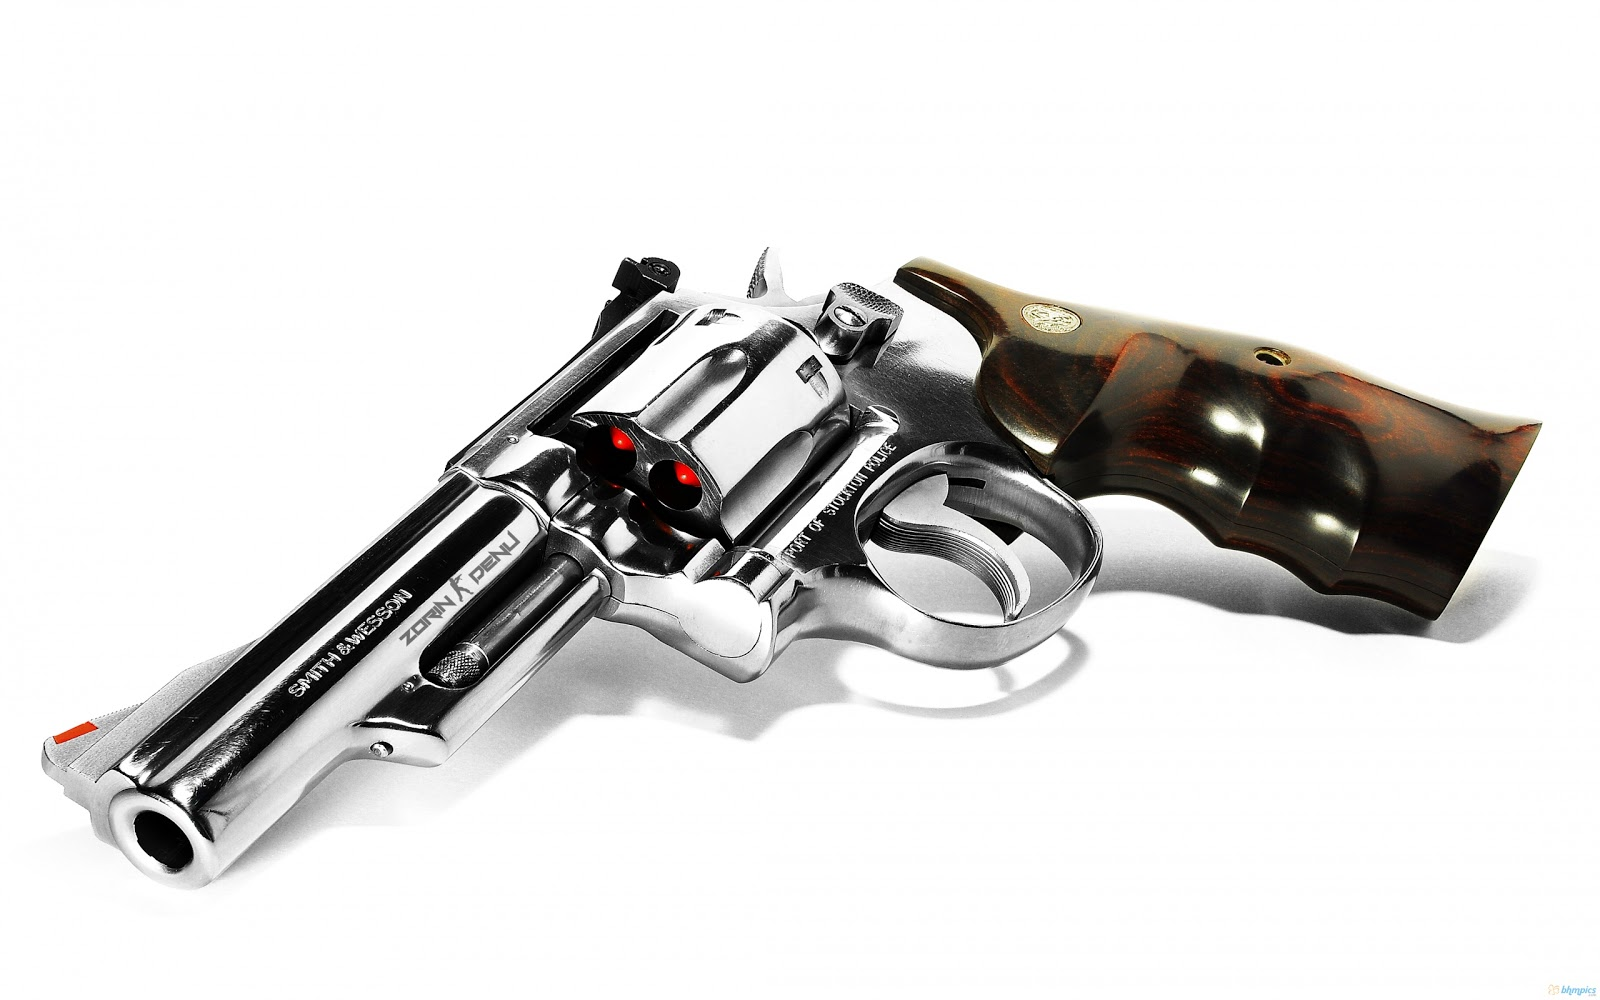 Pistol Gun Classic Wallpaper Download For PC 3 11632 Wallpaper Cool 1600x1000